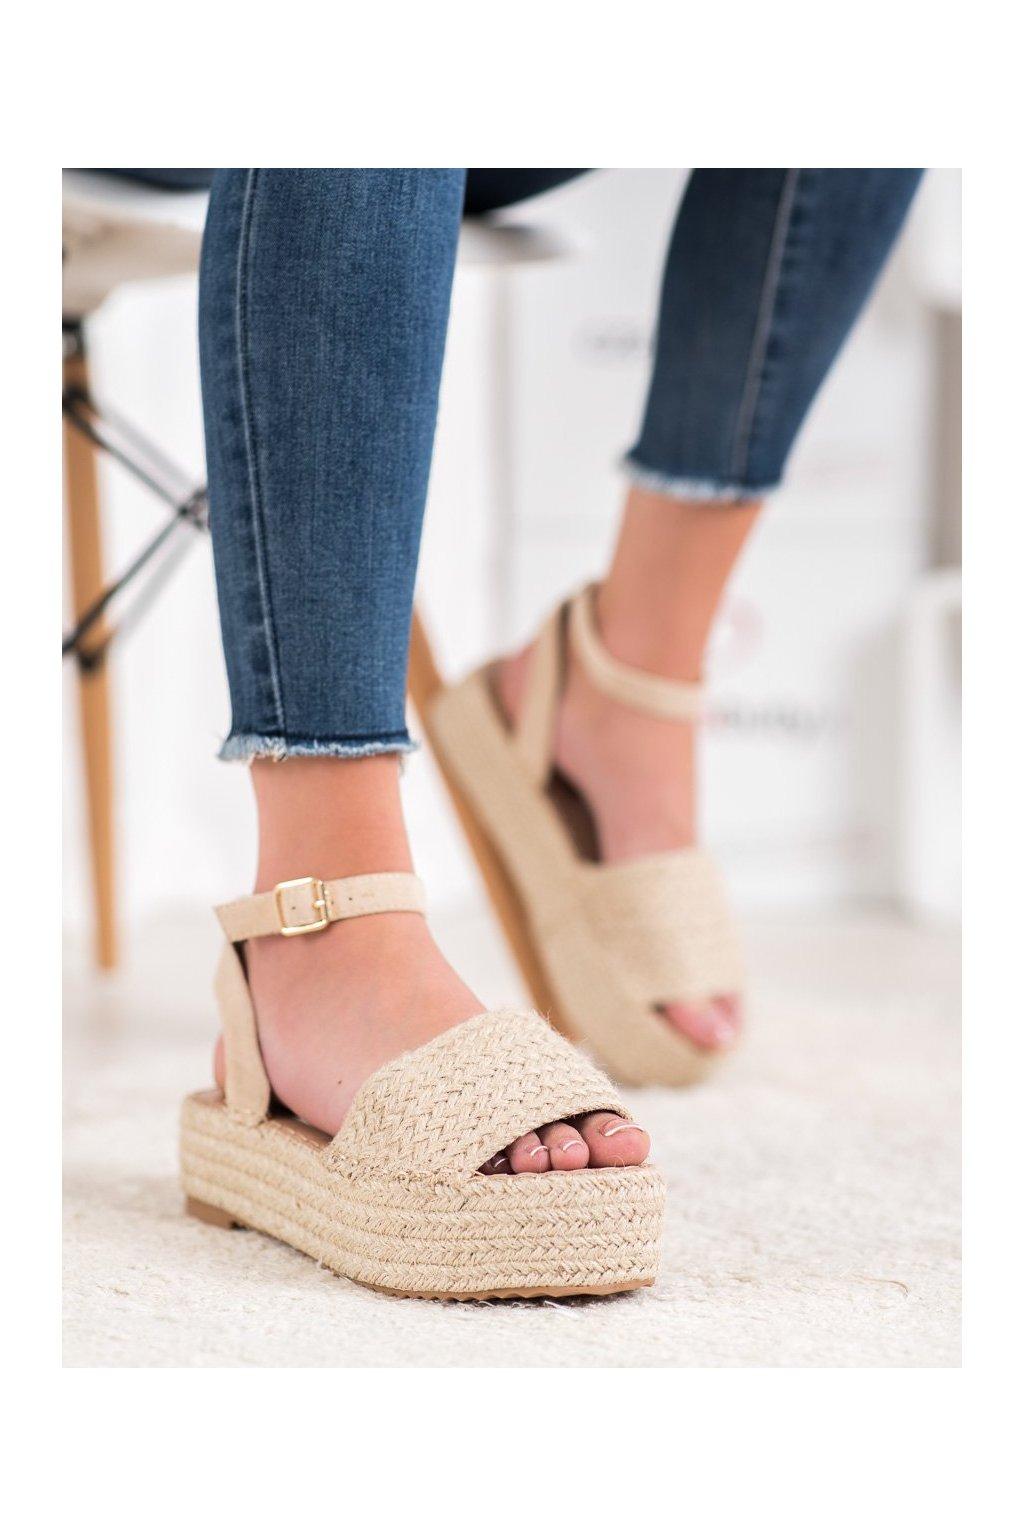 Hnedé sandále Weide kod Q738BE